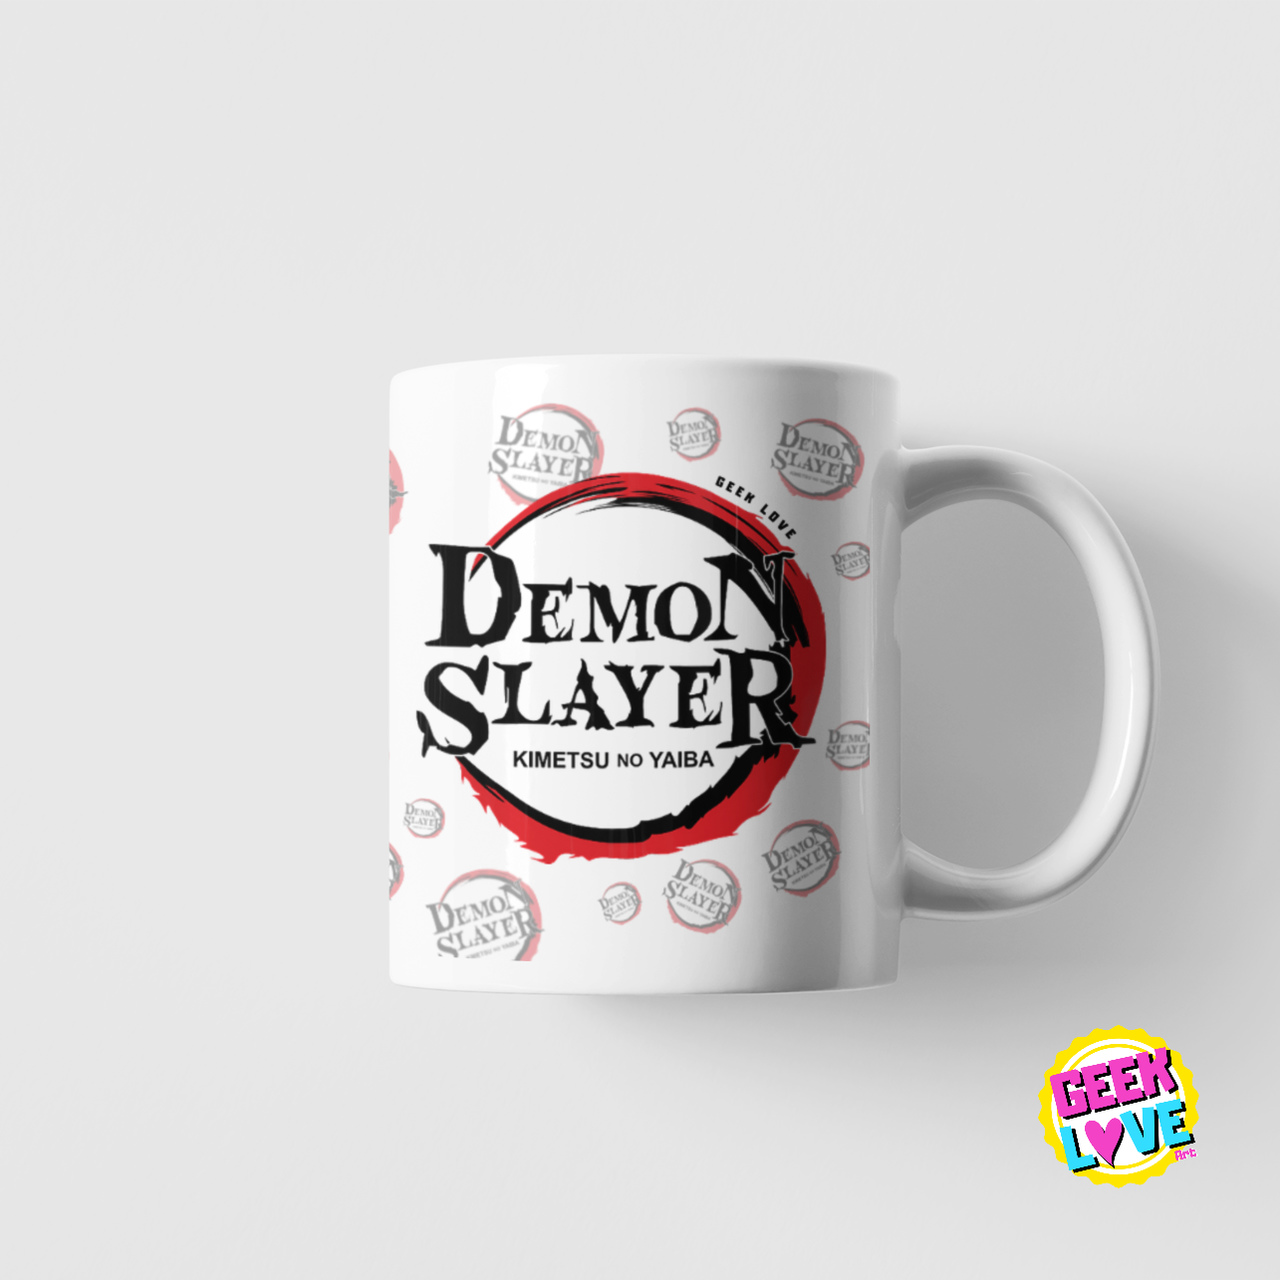 Caneca Geek Love Demon Slayer (Modelo 2)